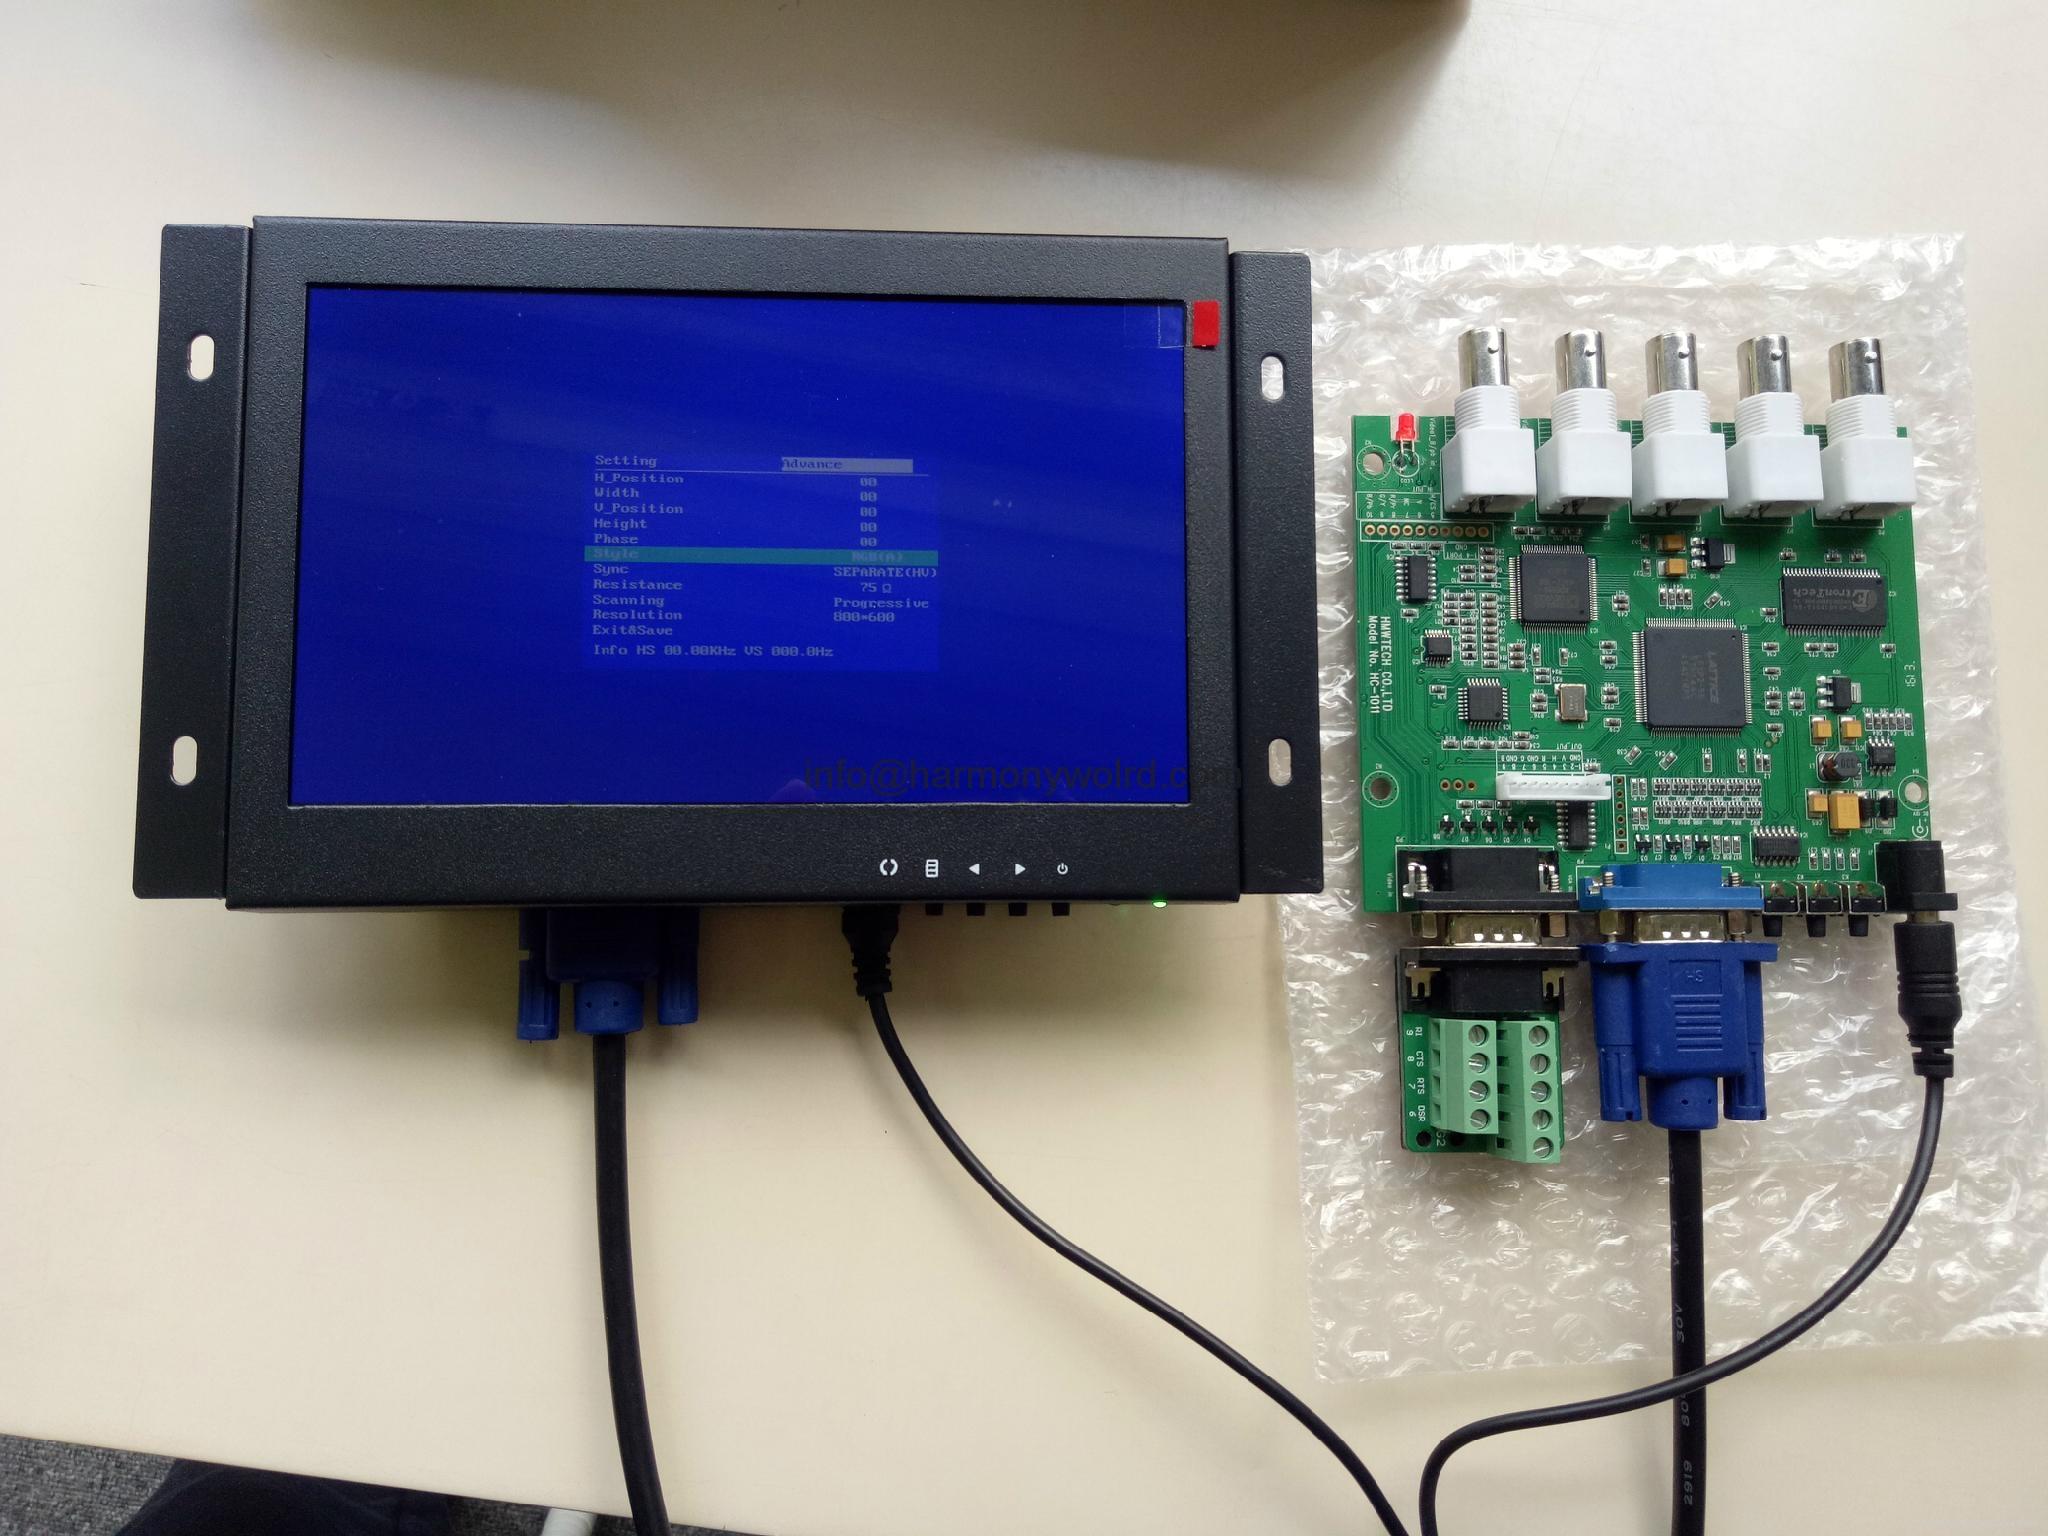 Upgrade Monitor for MOTOROLA M1000-100 M1000-155 M1000-190 MD1000-190 MD1000-390 4